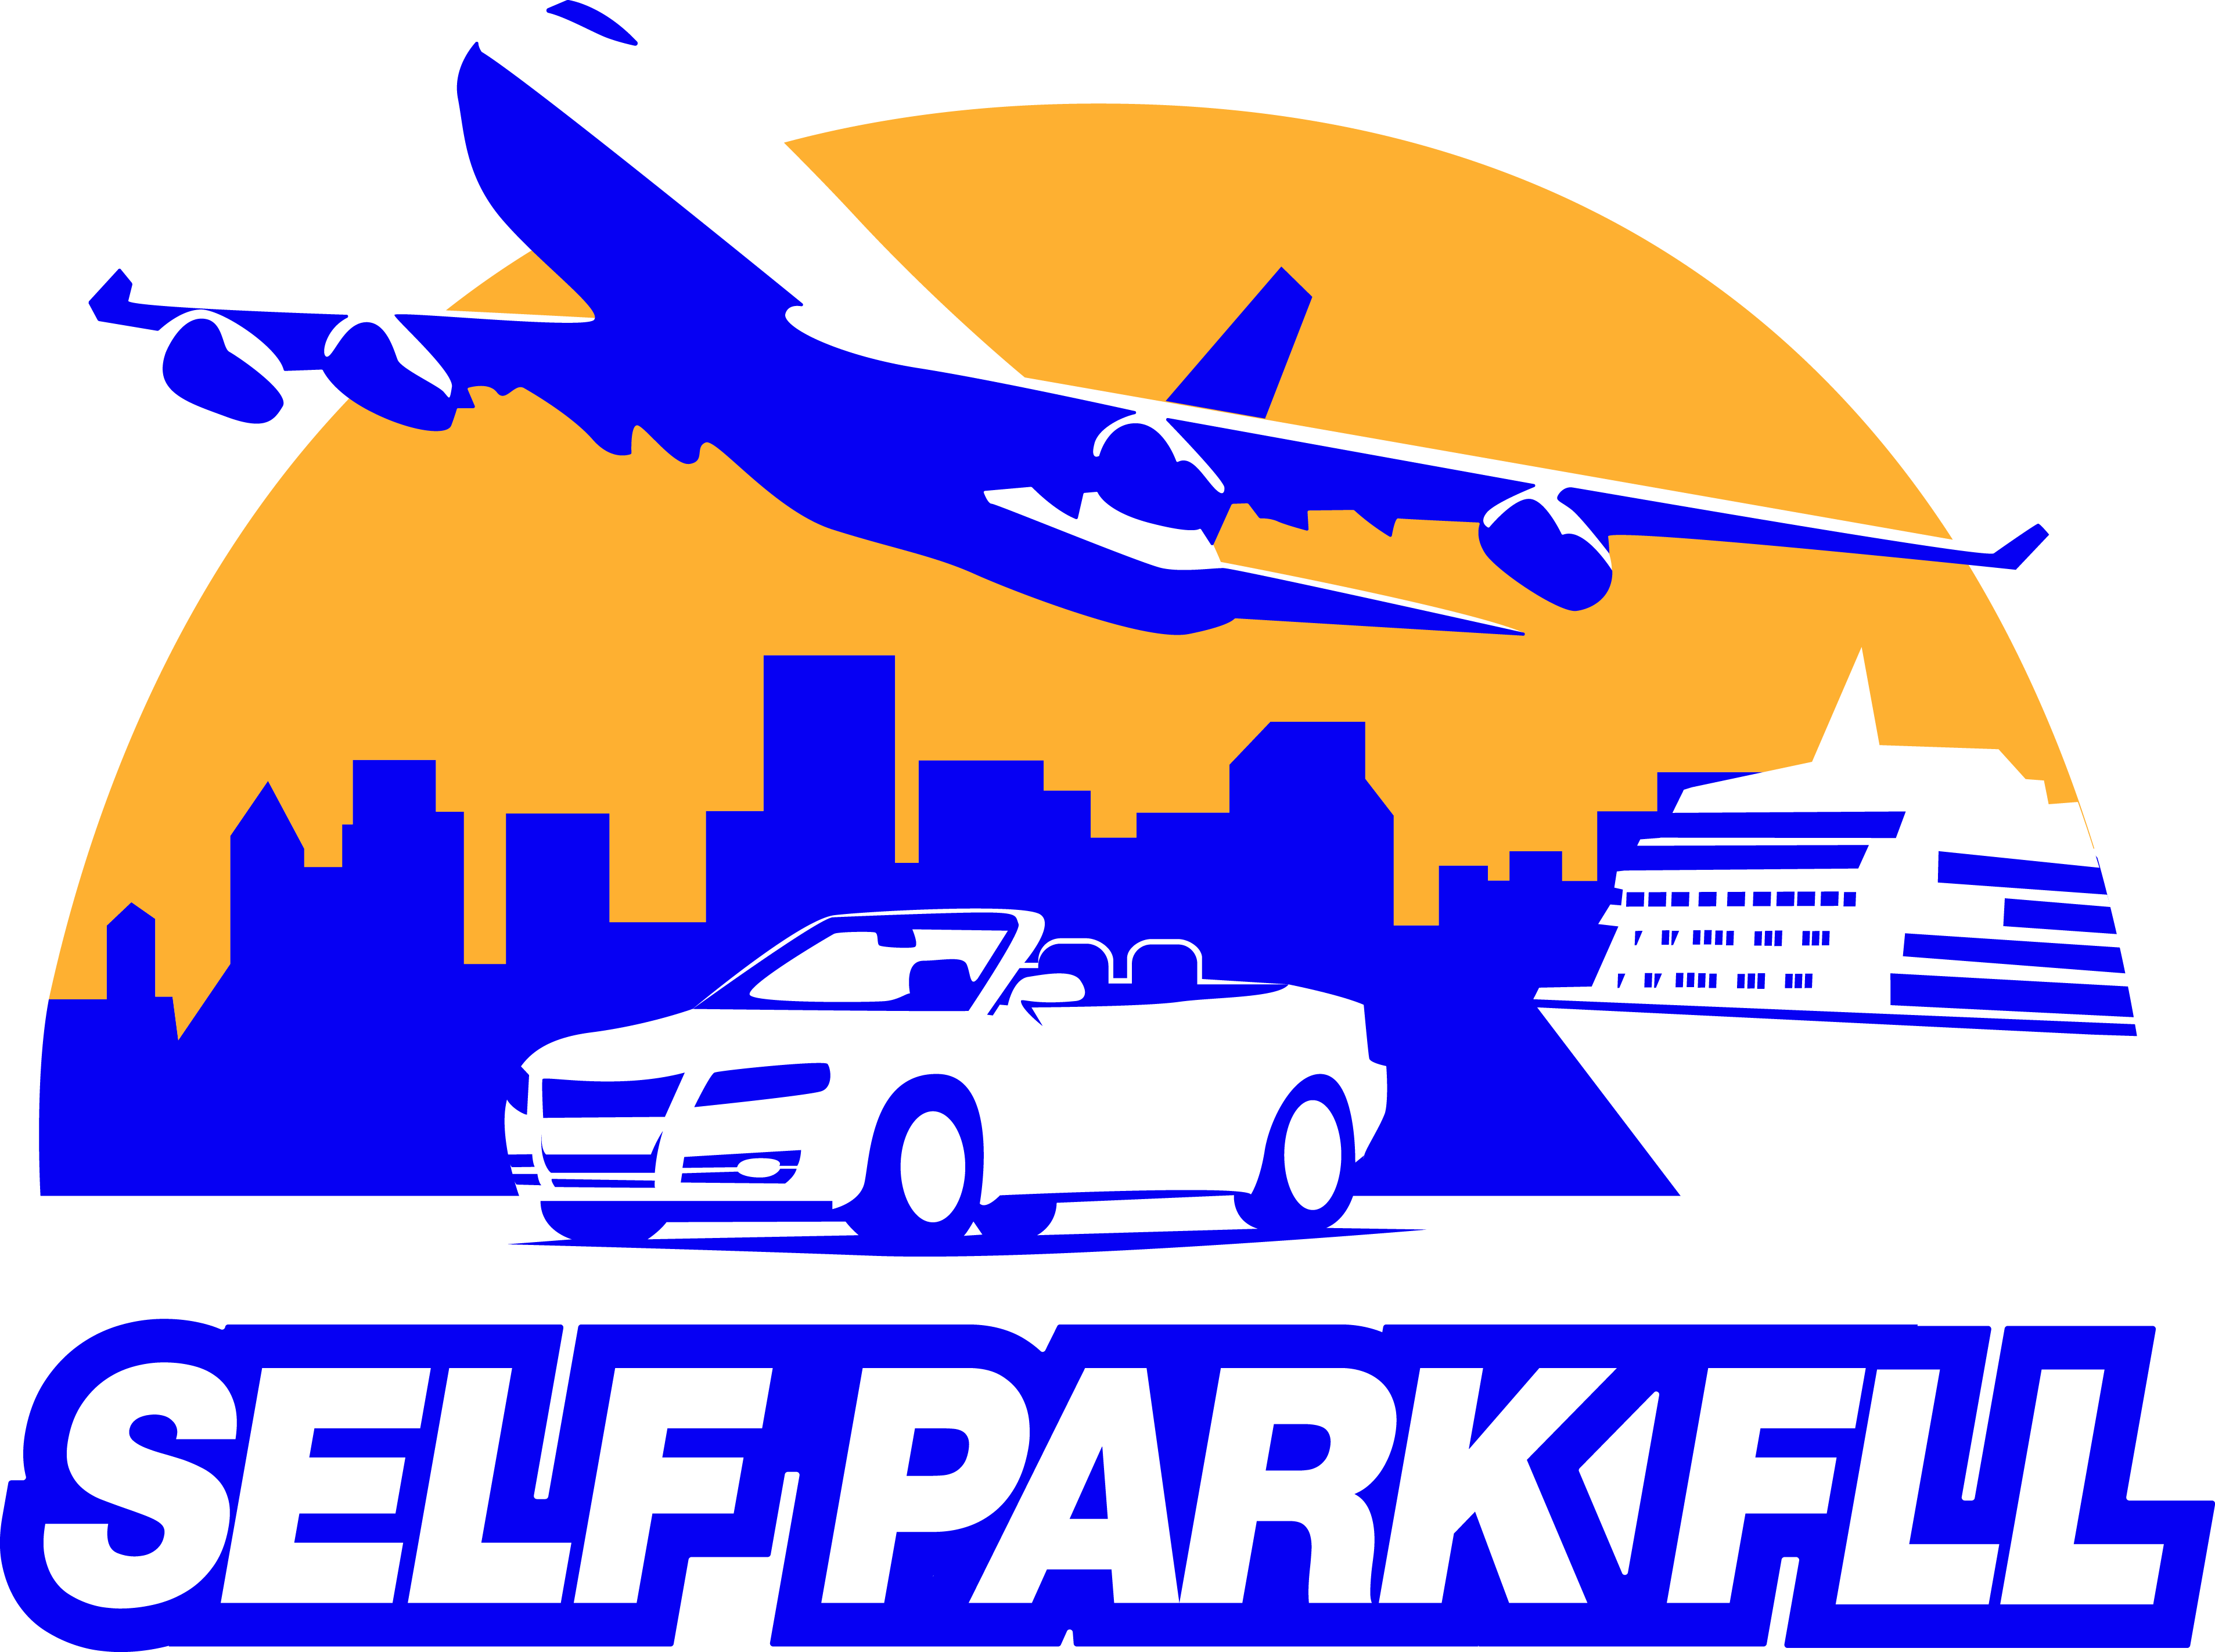 Fort Lauderdale Airport Parking Garage Rates Dandk Organizer